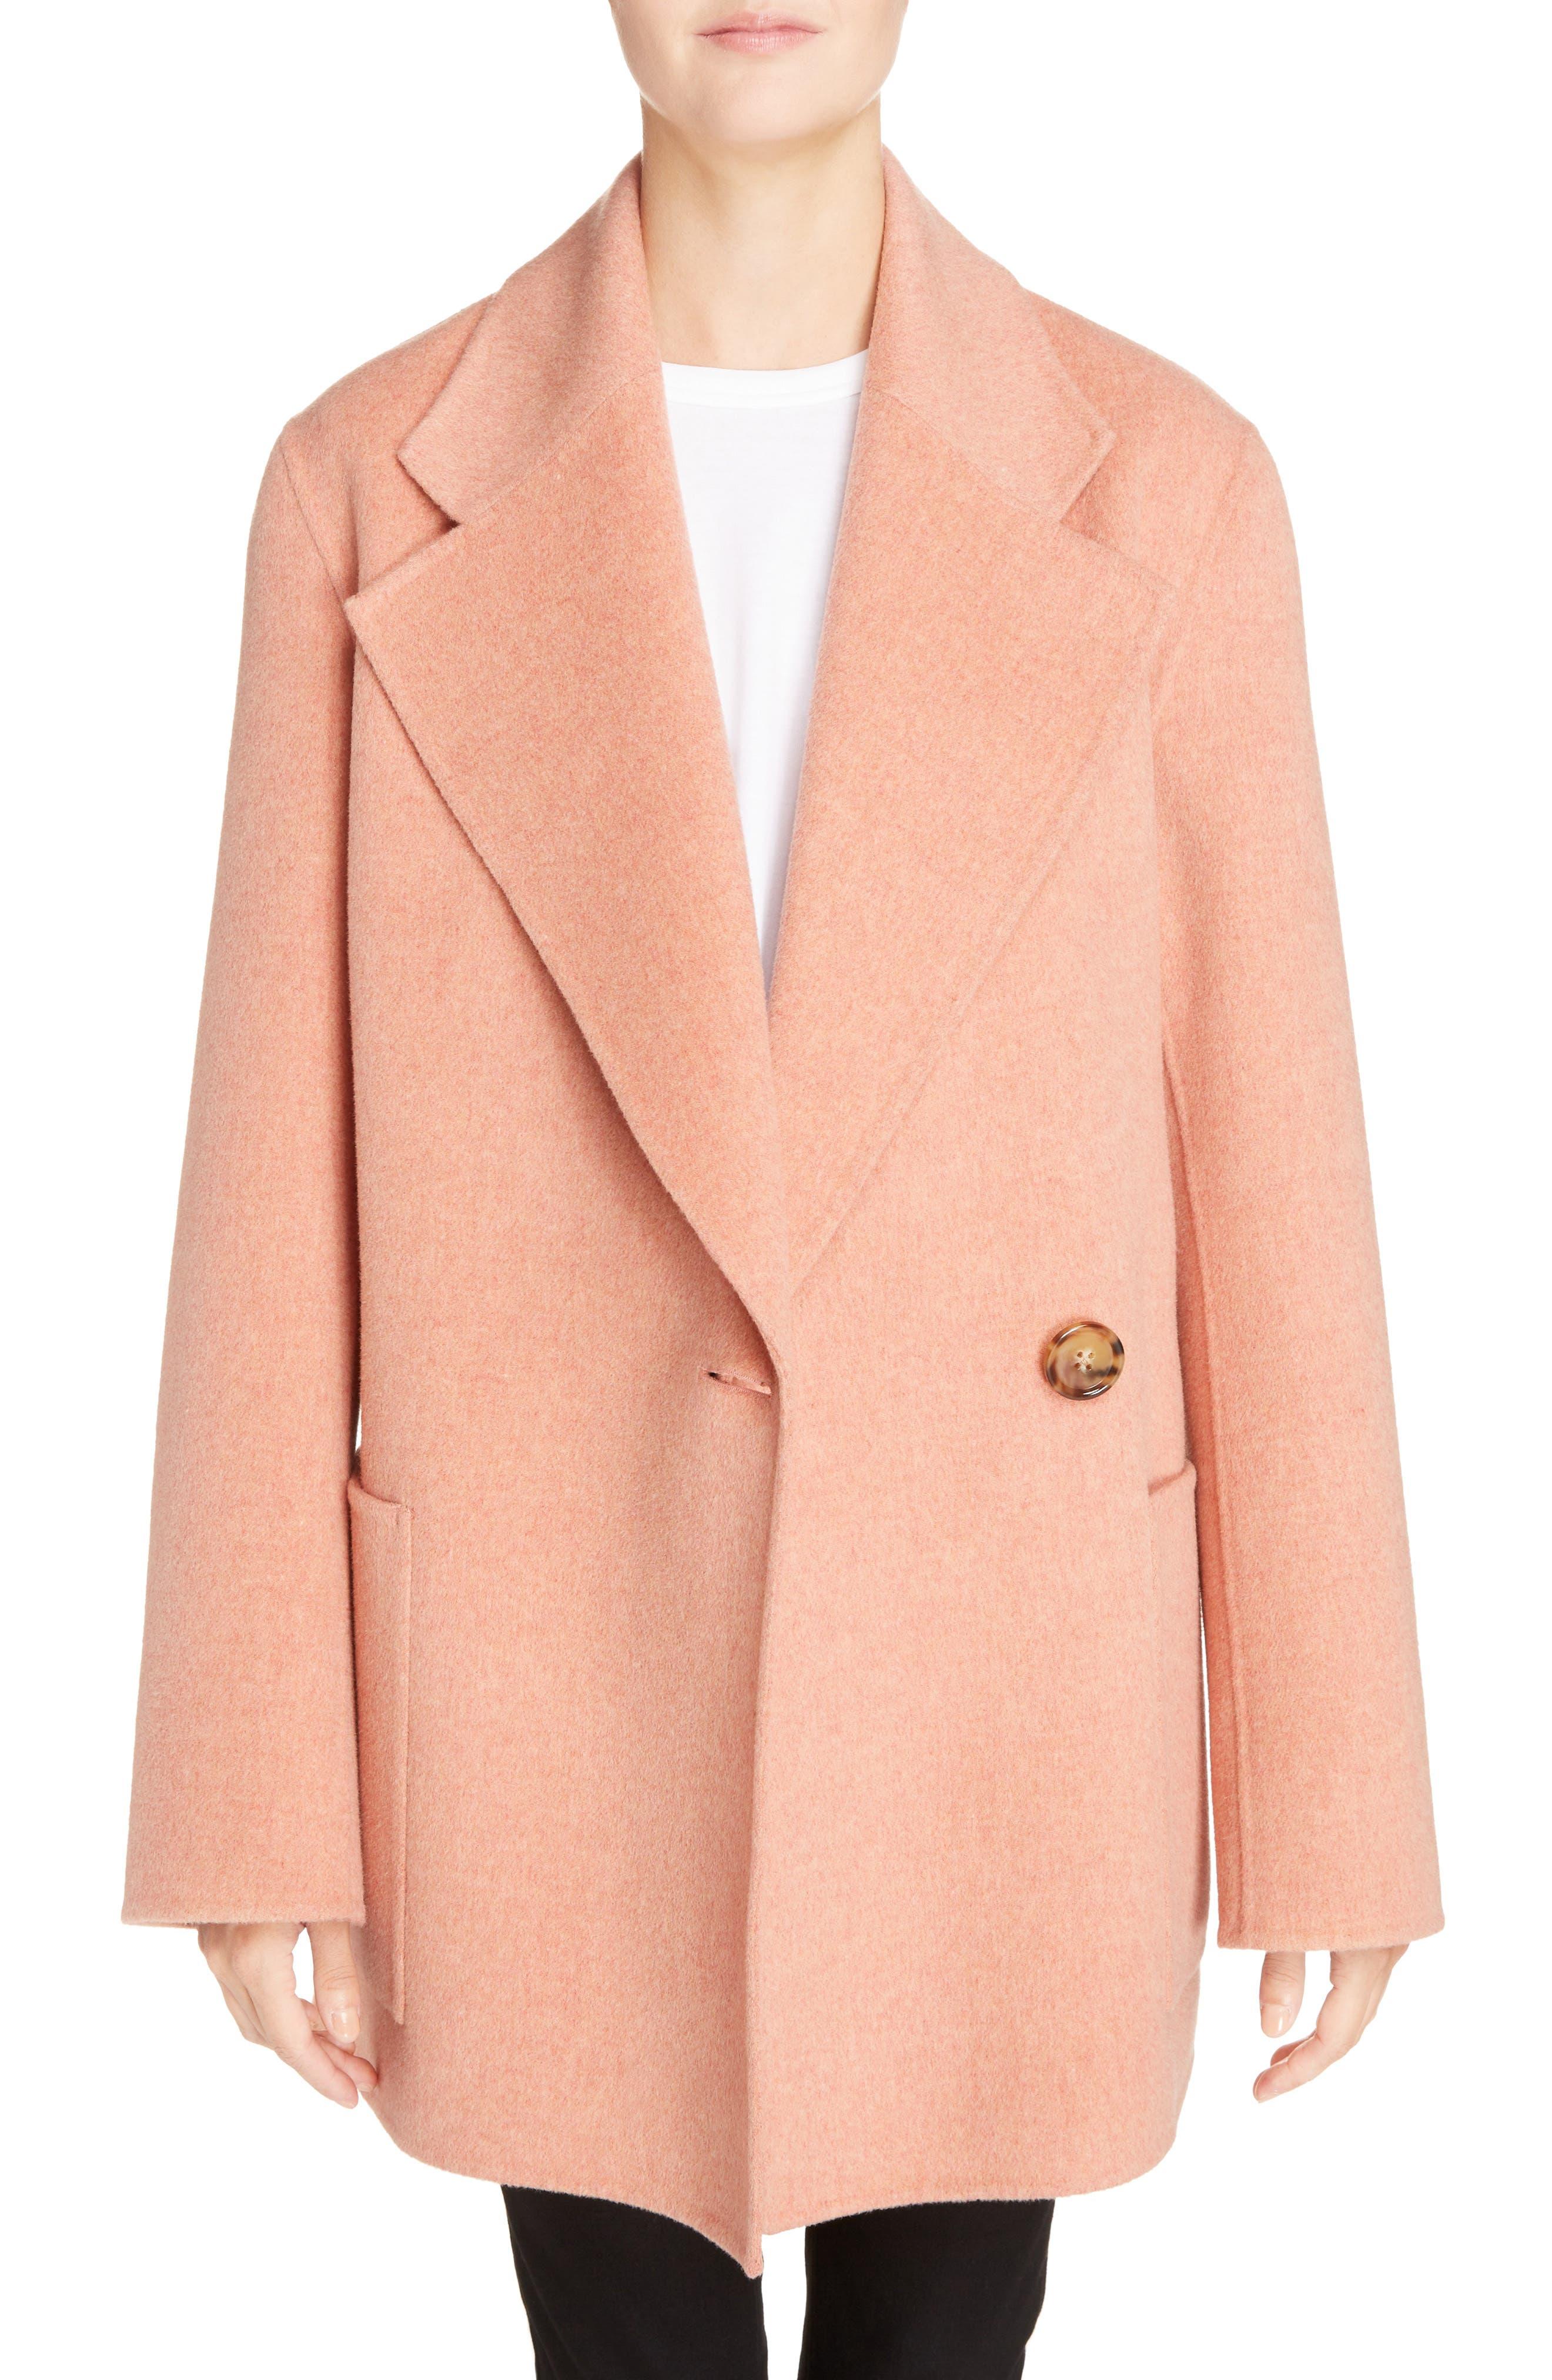 Anika Doublé Wool & Cashmere Coat,                         Main,                         color, Rose Melange